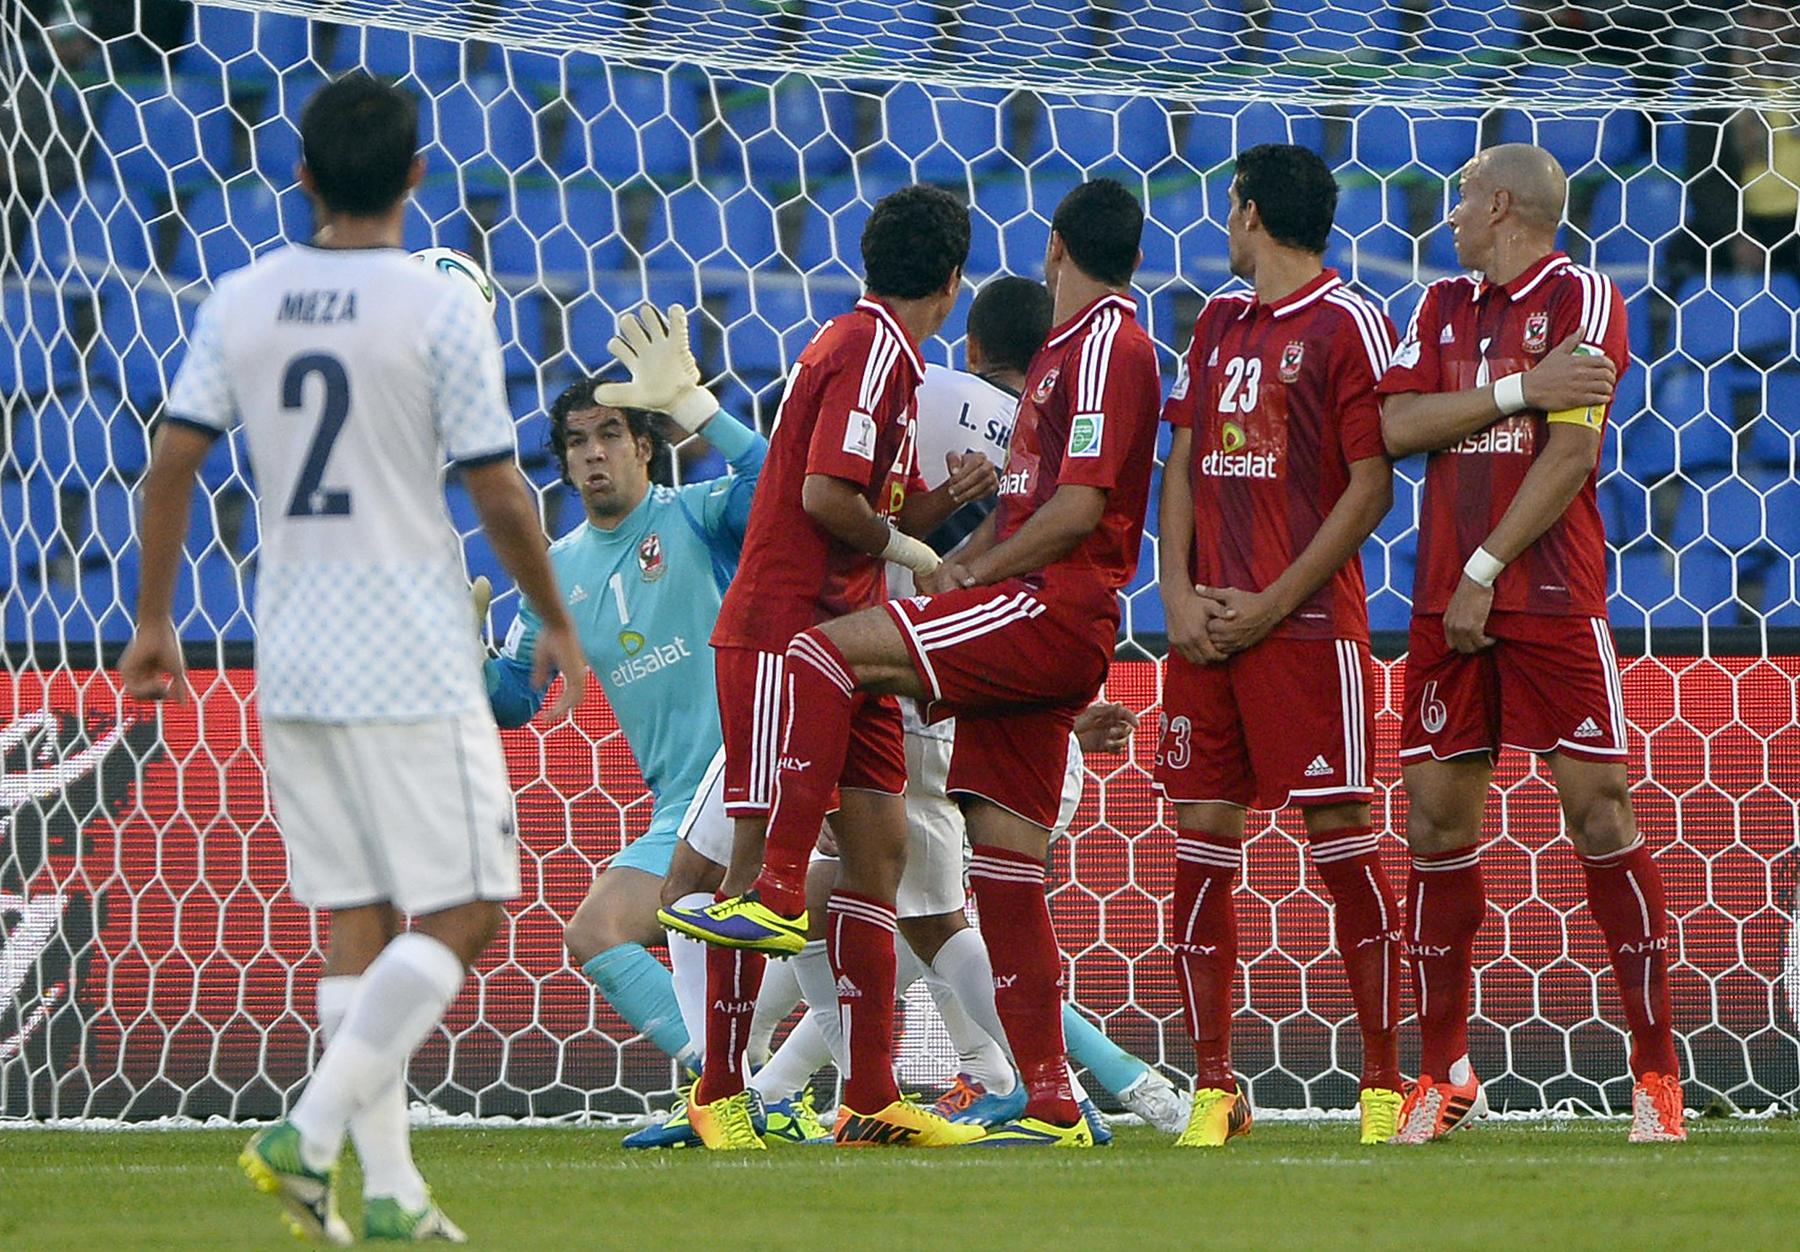 Al Ahly SC CF Monterrey Club World Cup 2013